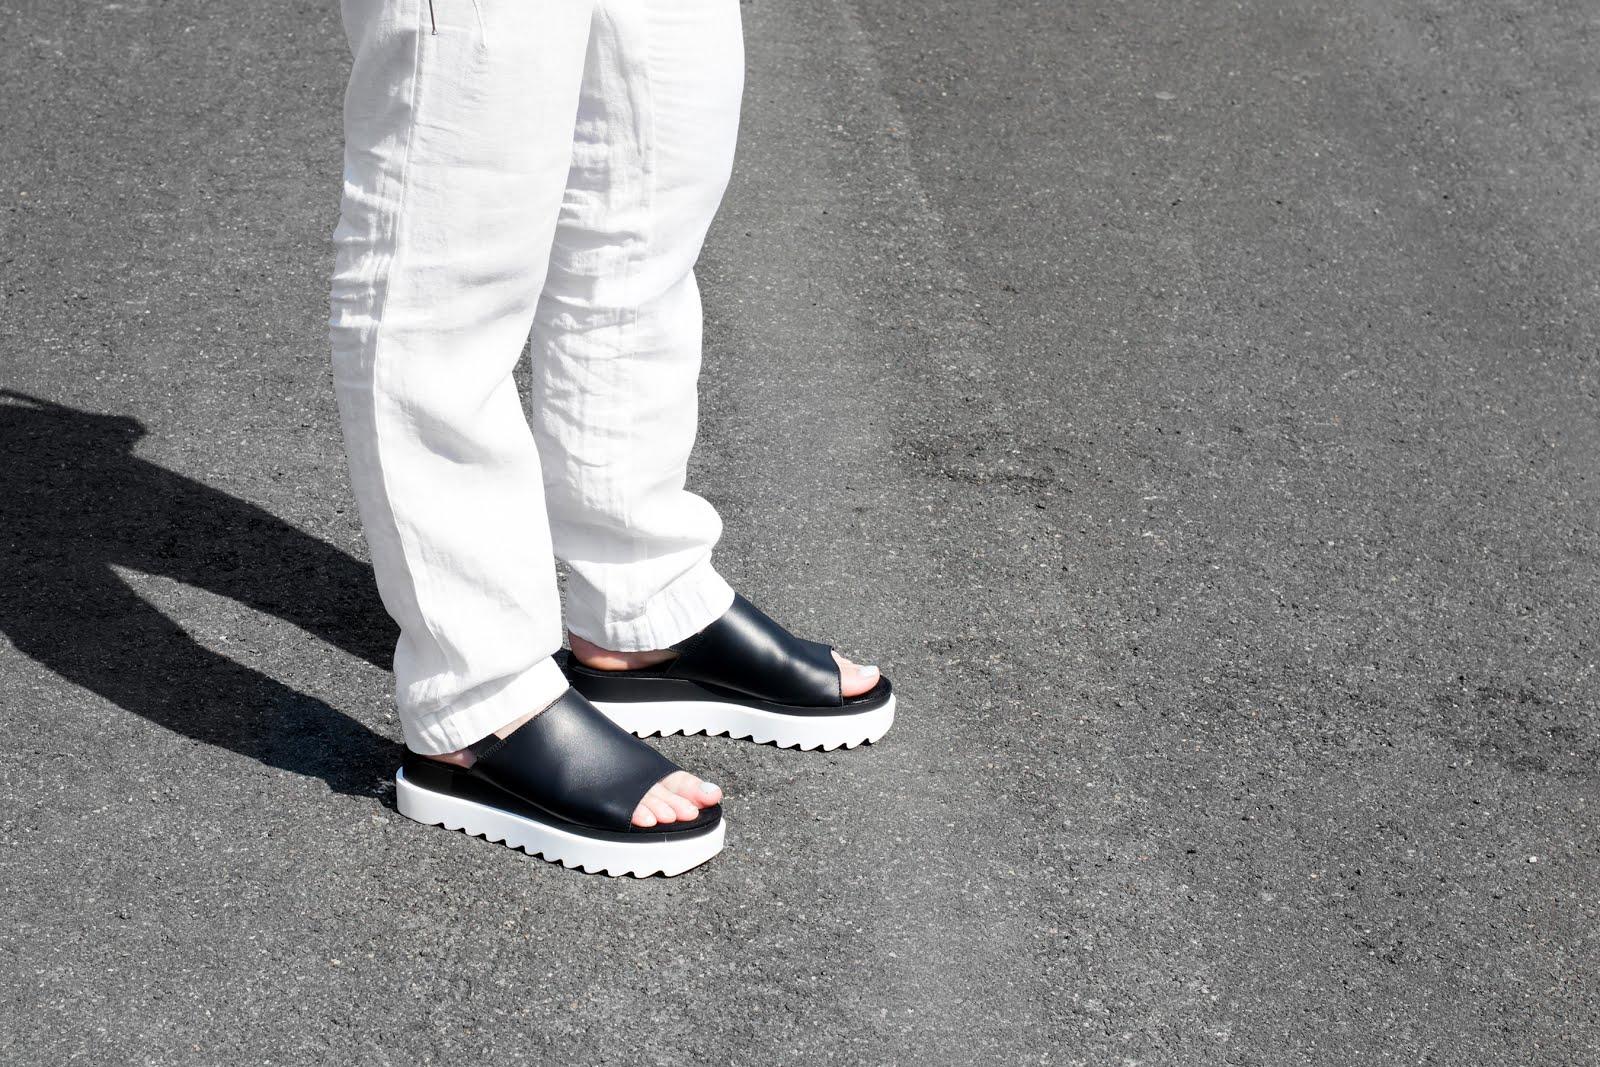 s.oliver, linen, black and white, outfit, sandals, plateau, minimalist, blogger, belium